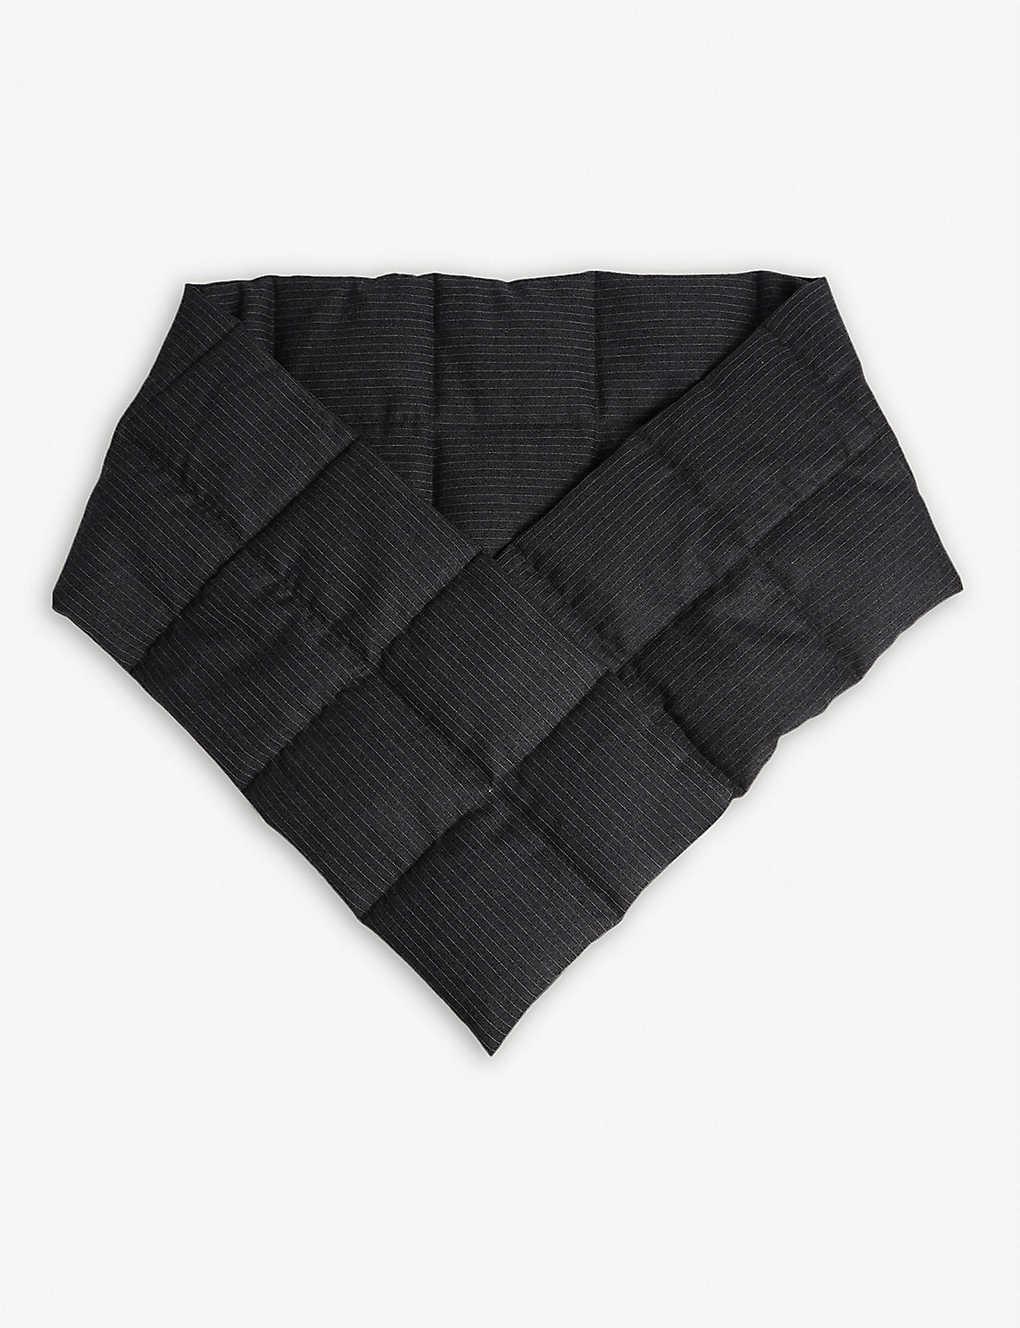 Dries Van Noten Accessories Pinstripe quilted wool scarf